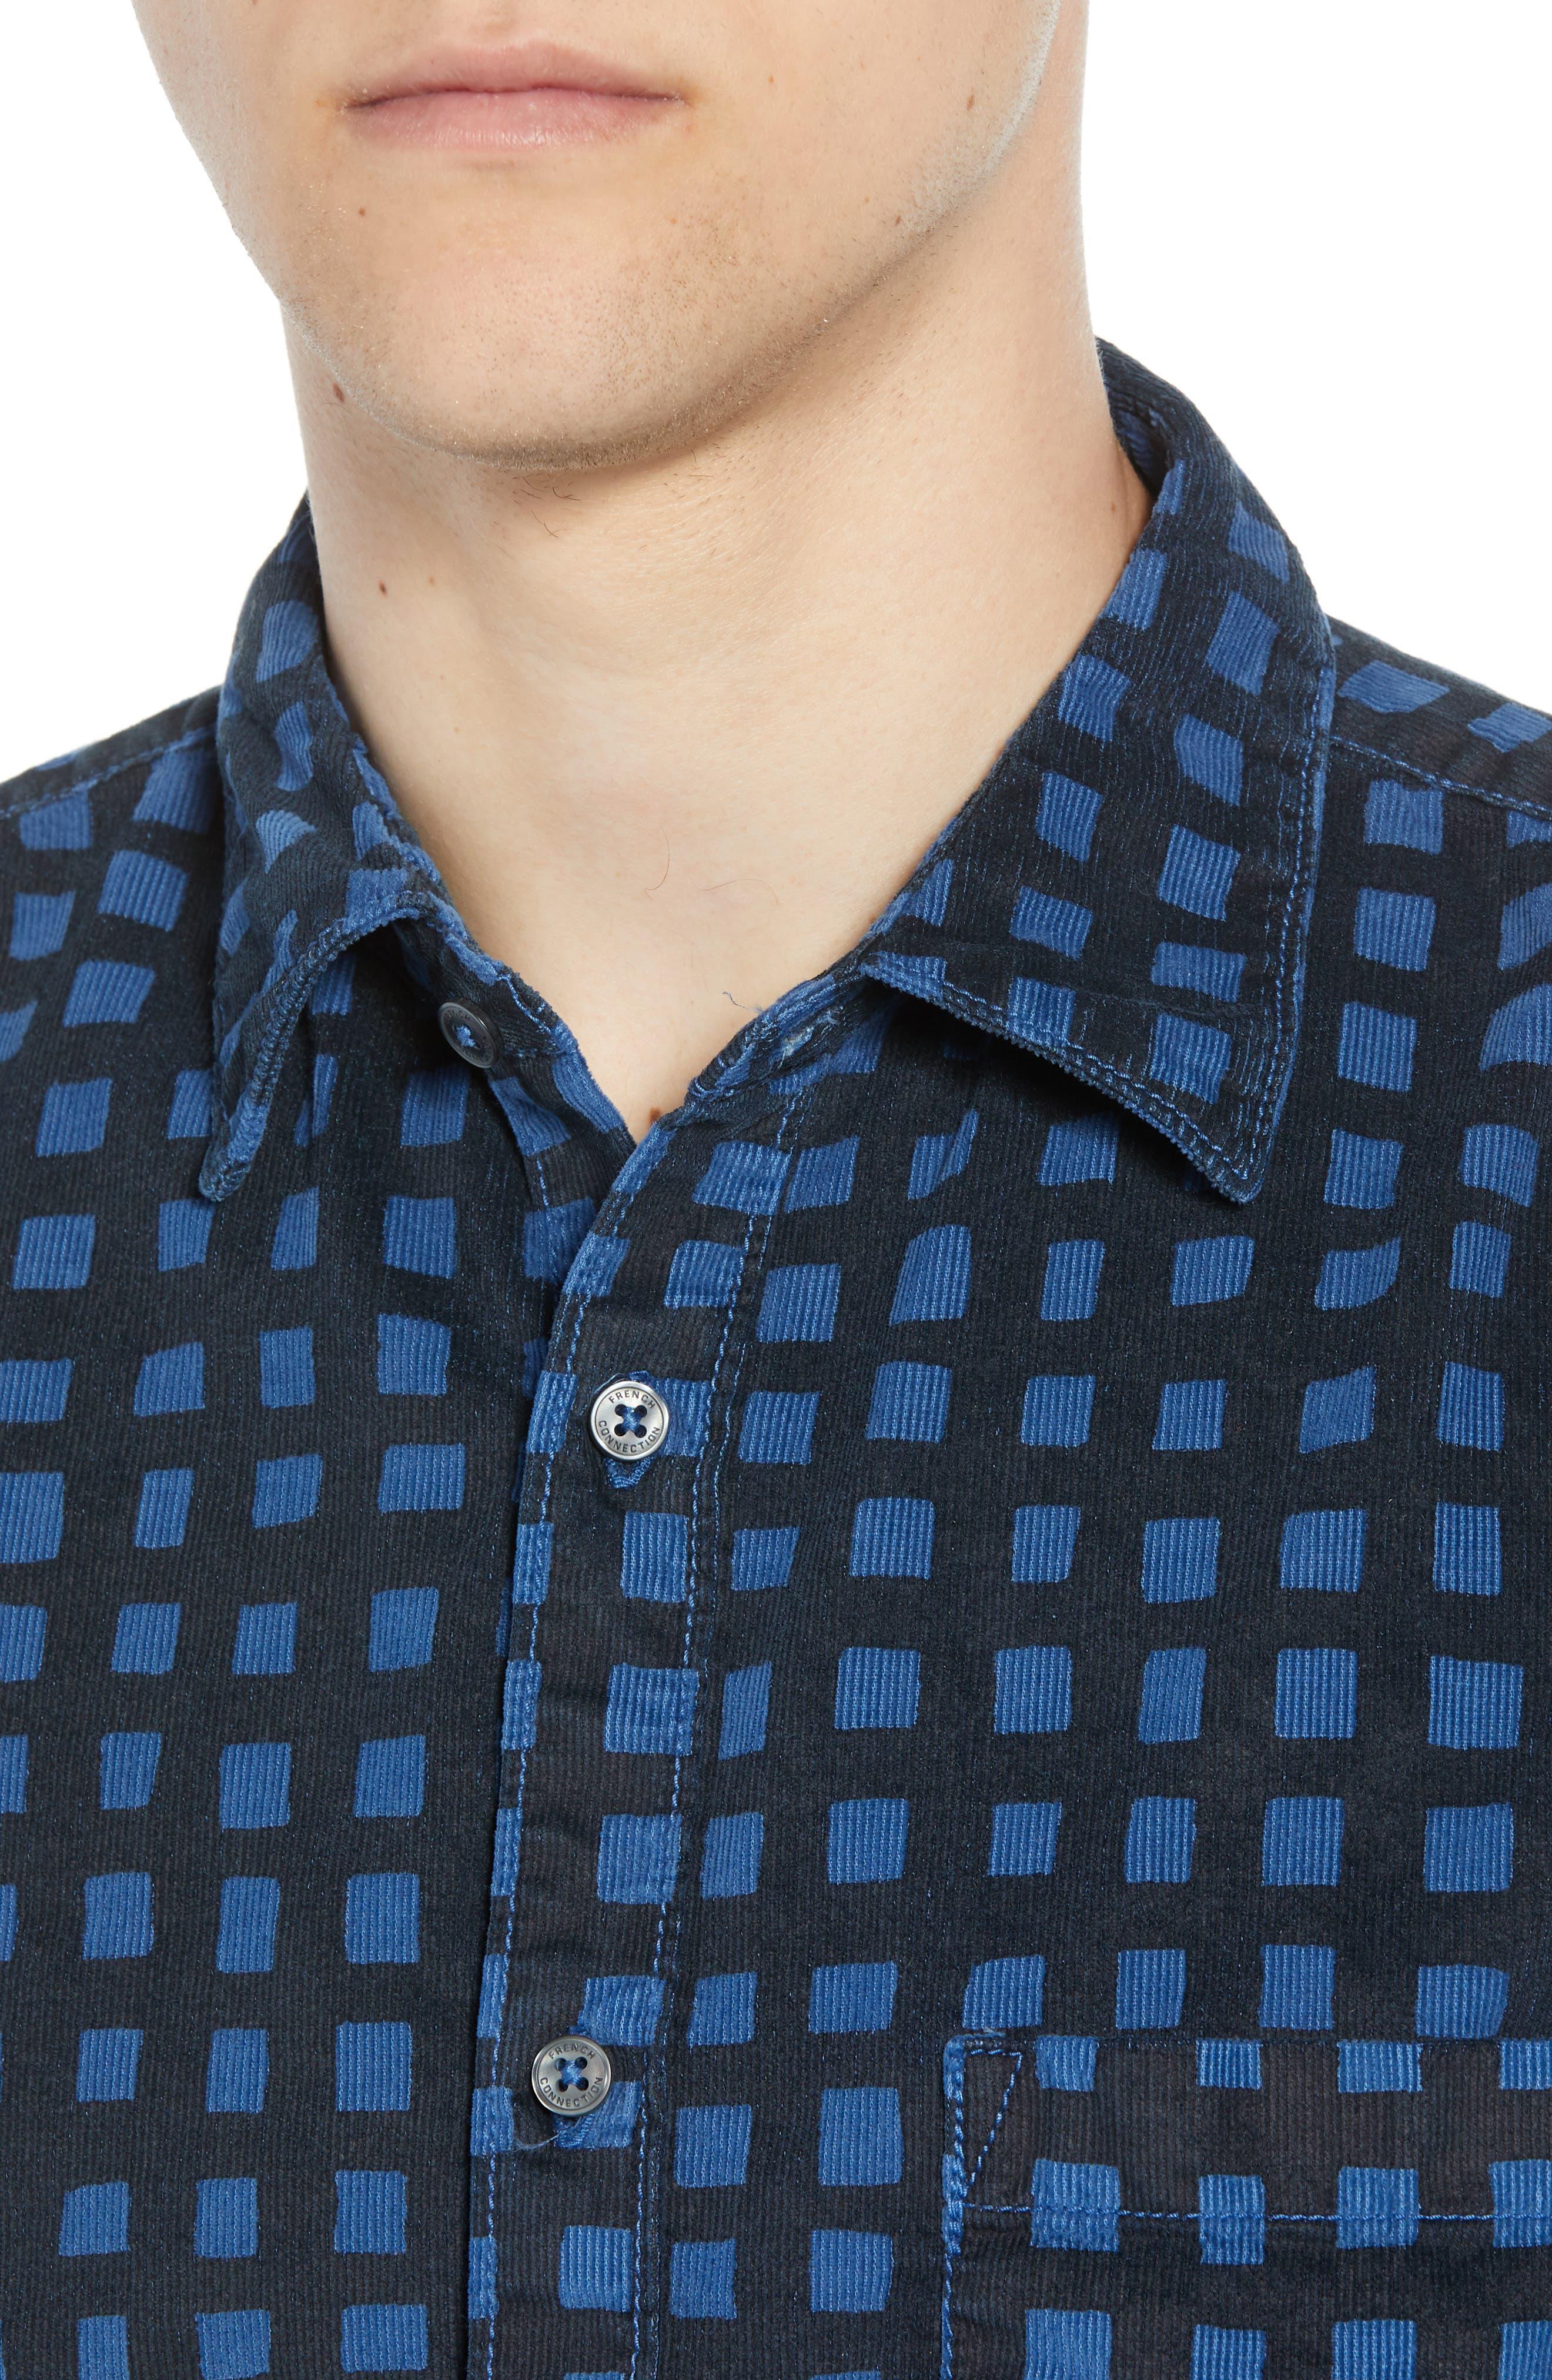 Gridlock Regular Fit Corduroy Shirt,                             Alternate thumbnail 2, color,                             FATHOM BLUE